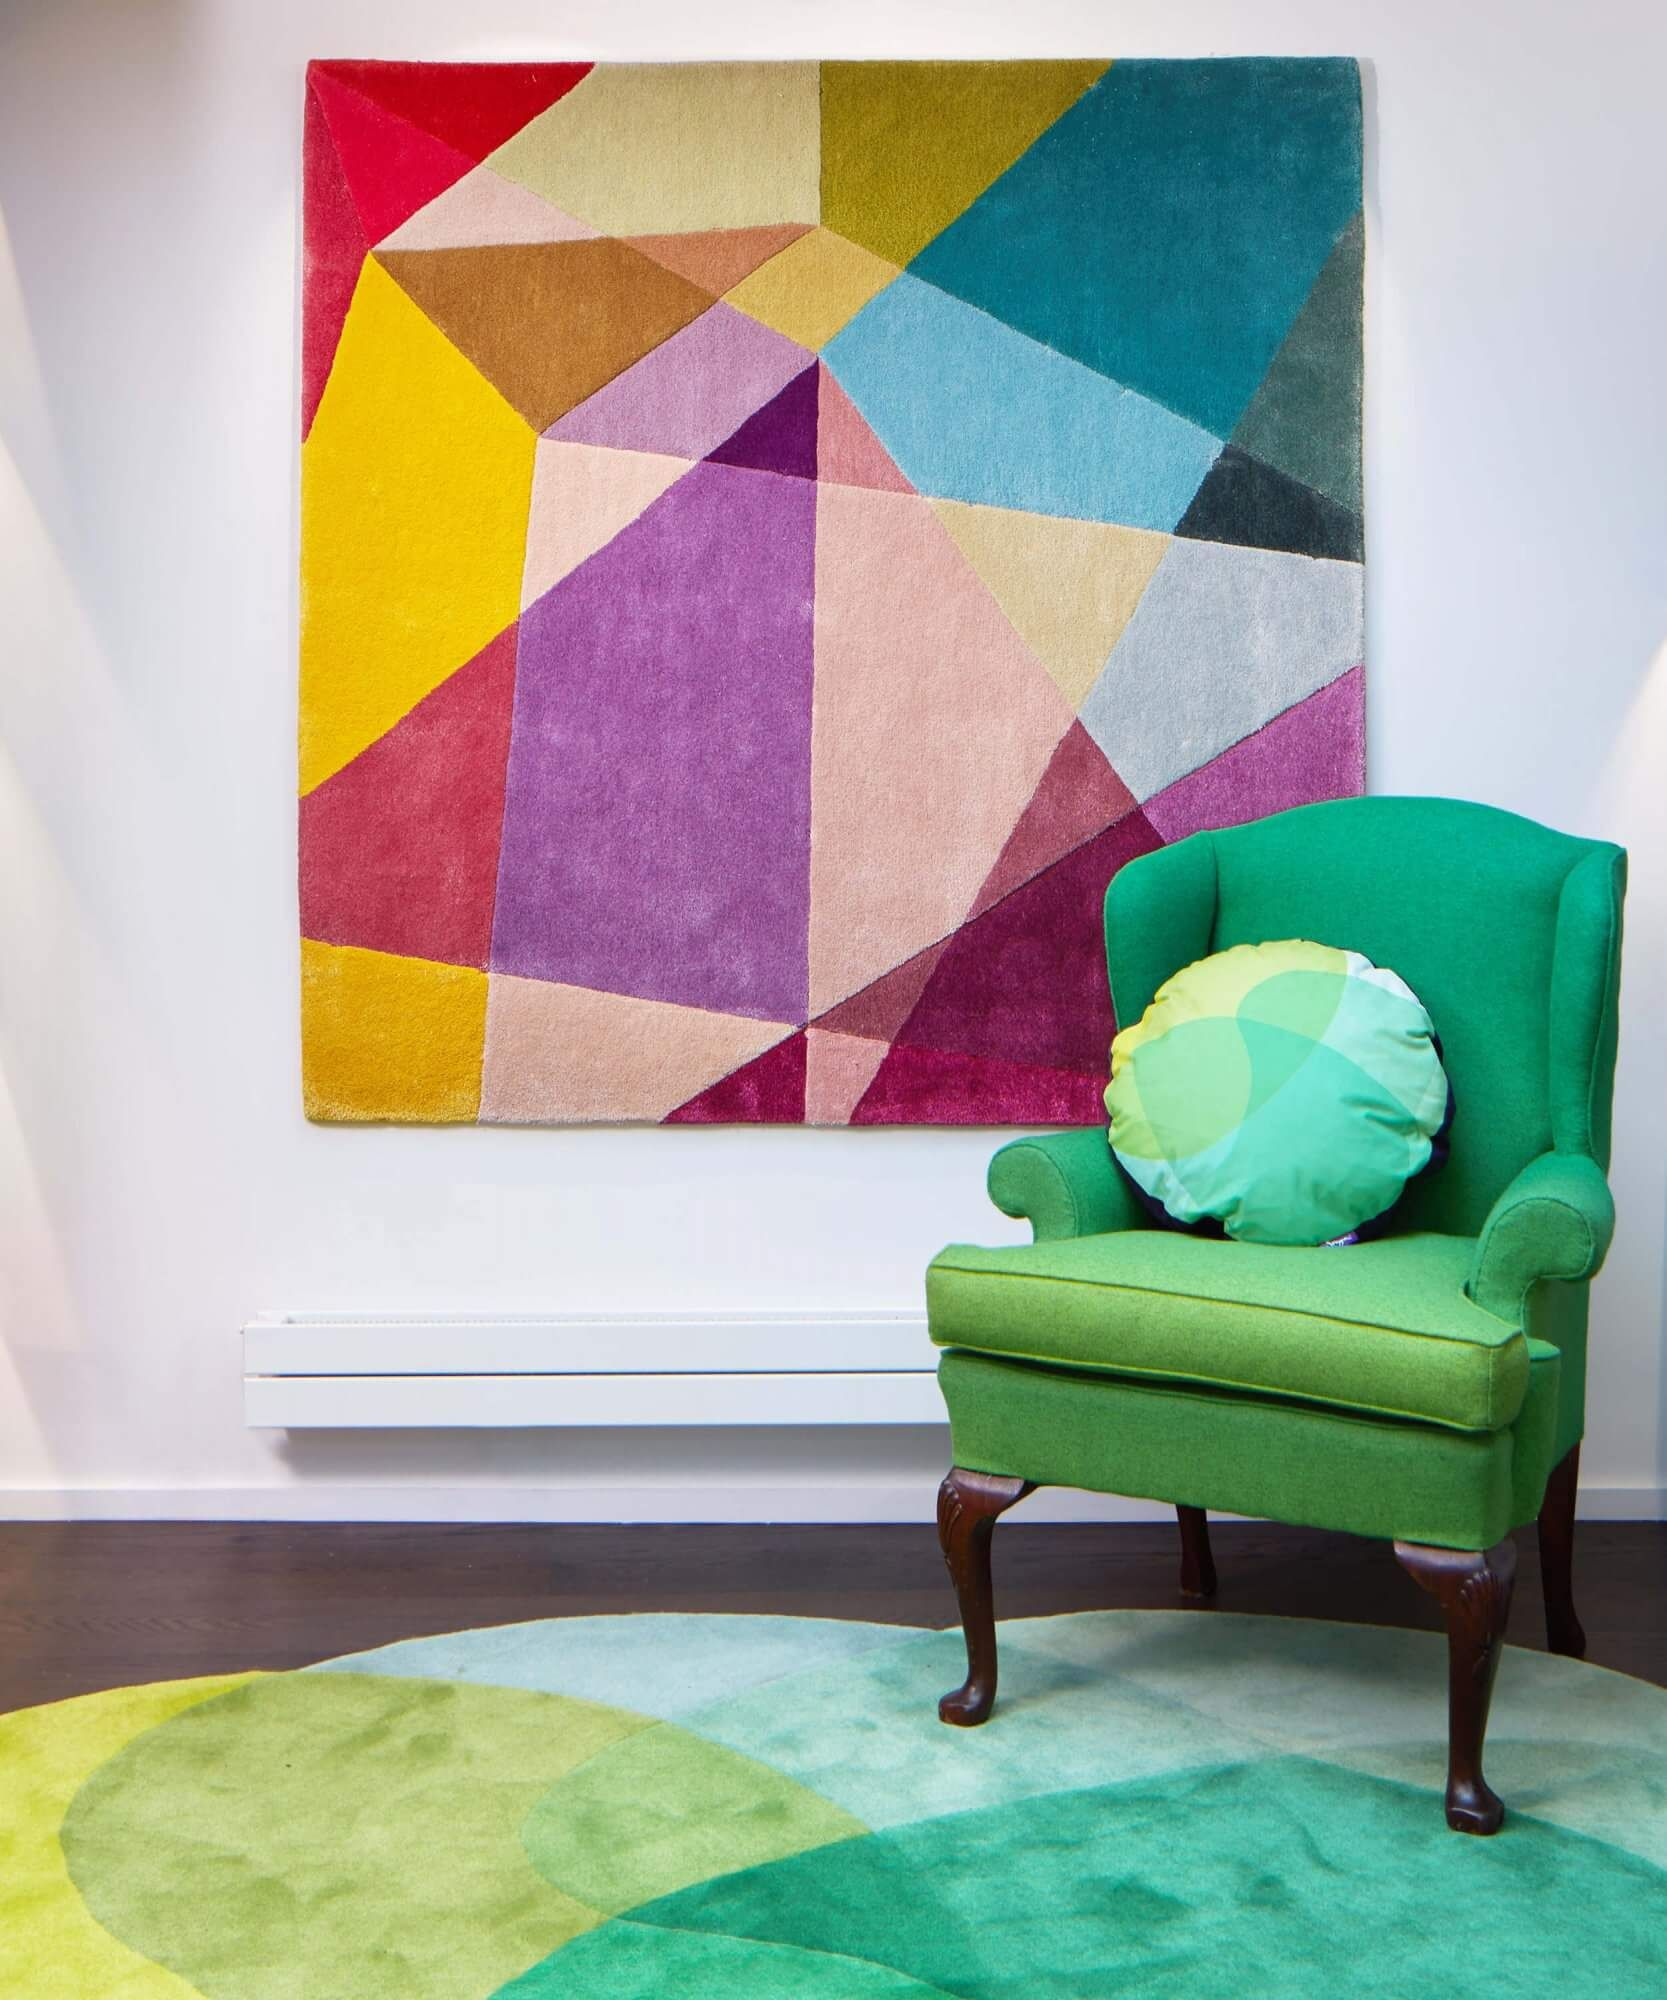 Prism Vibrant Rectangle Rug Modern Colour Geometric